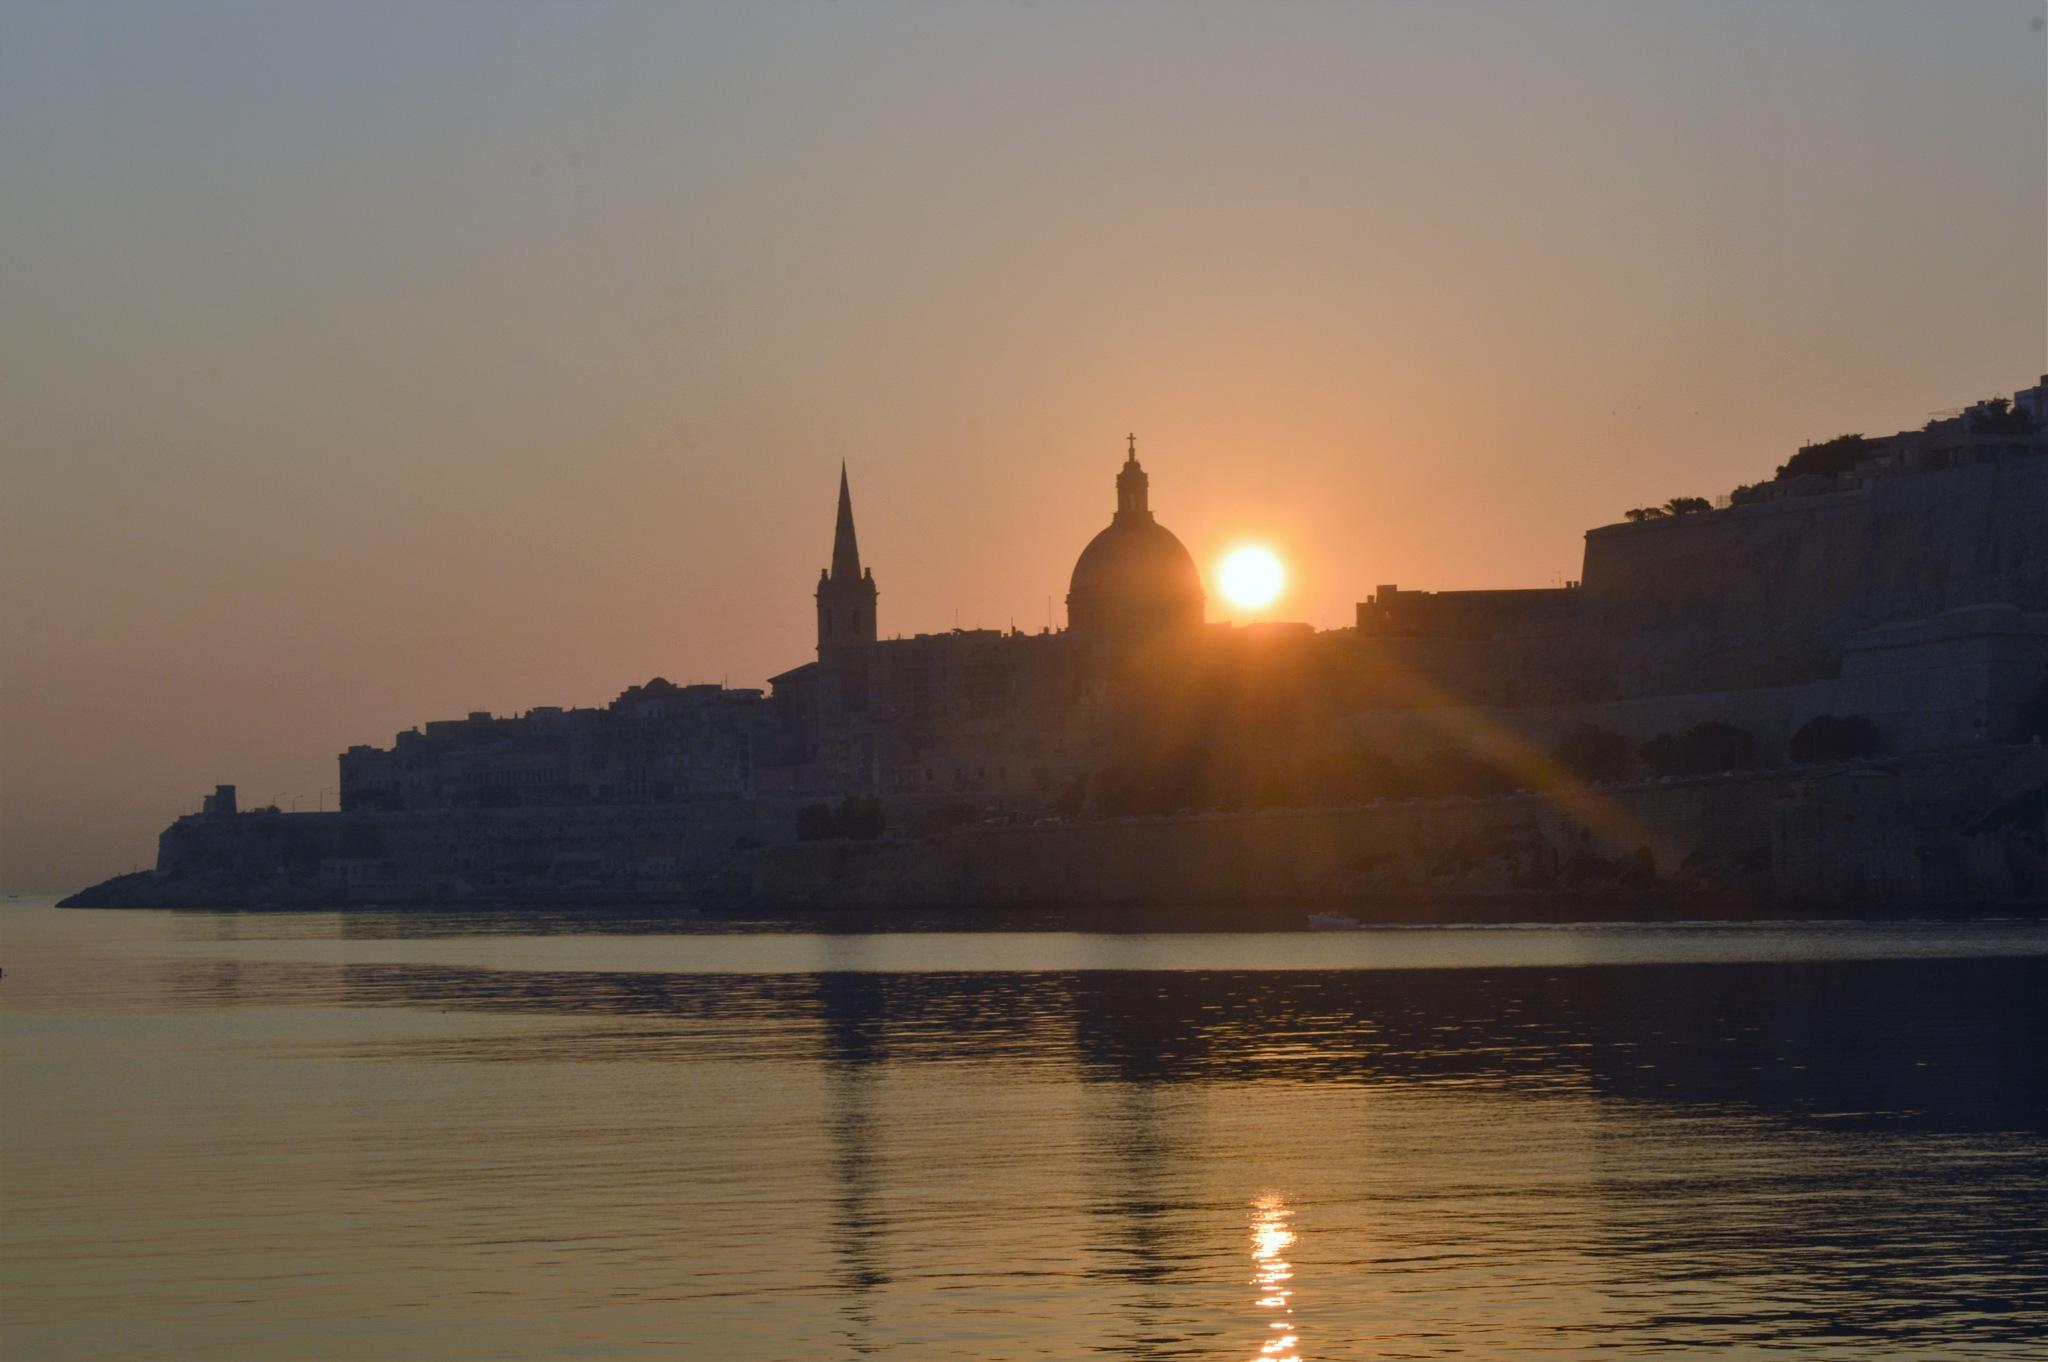 sunset by carmeldeguara47